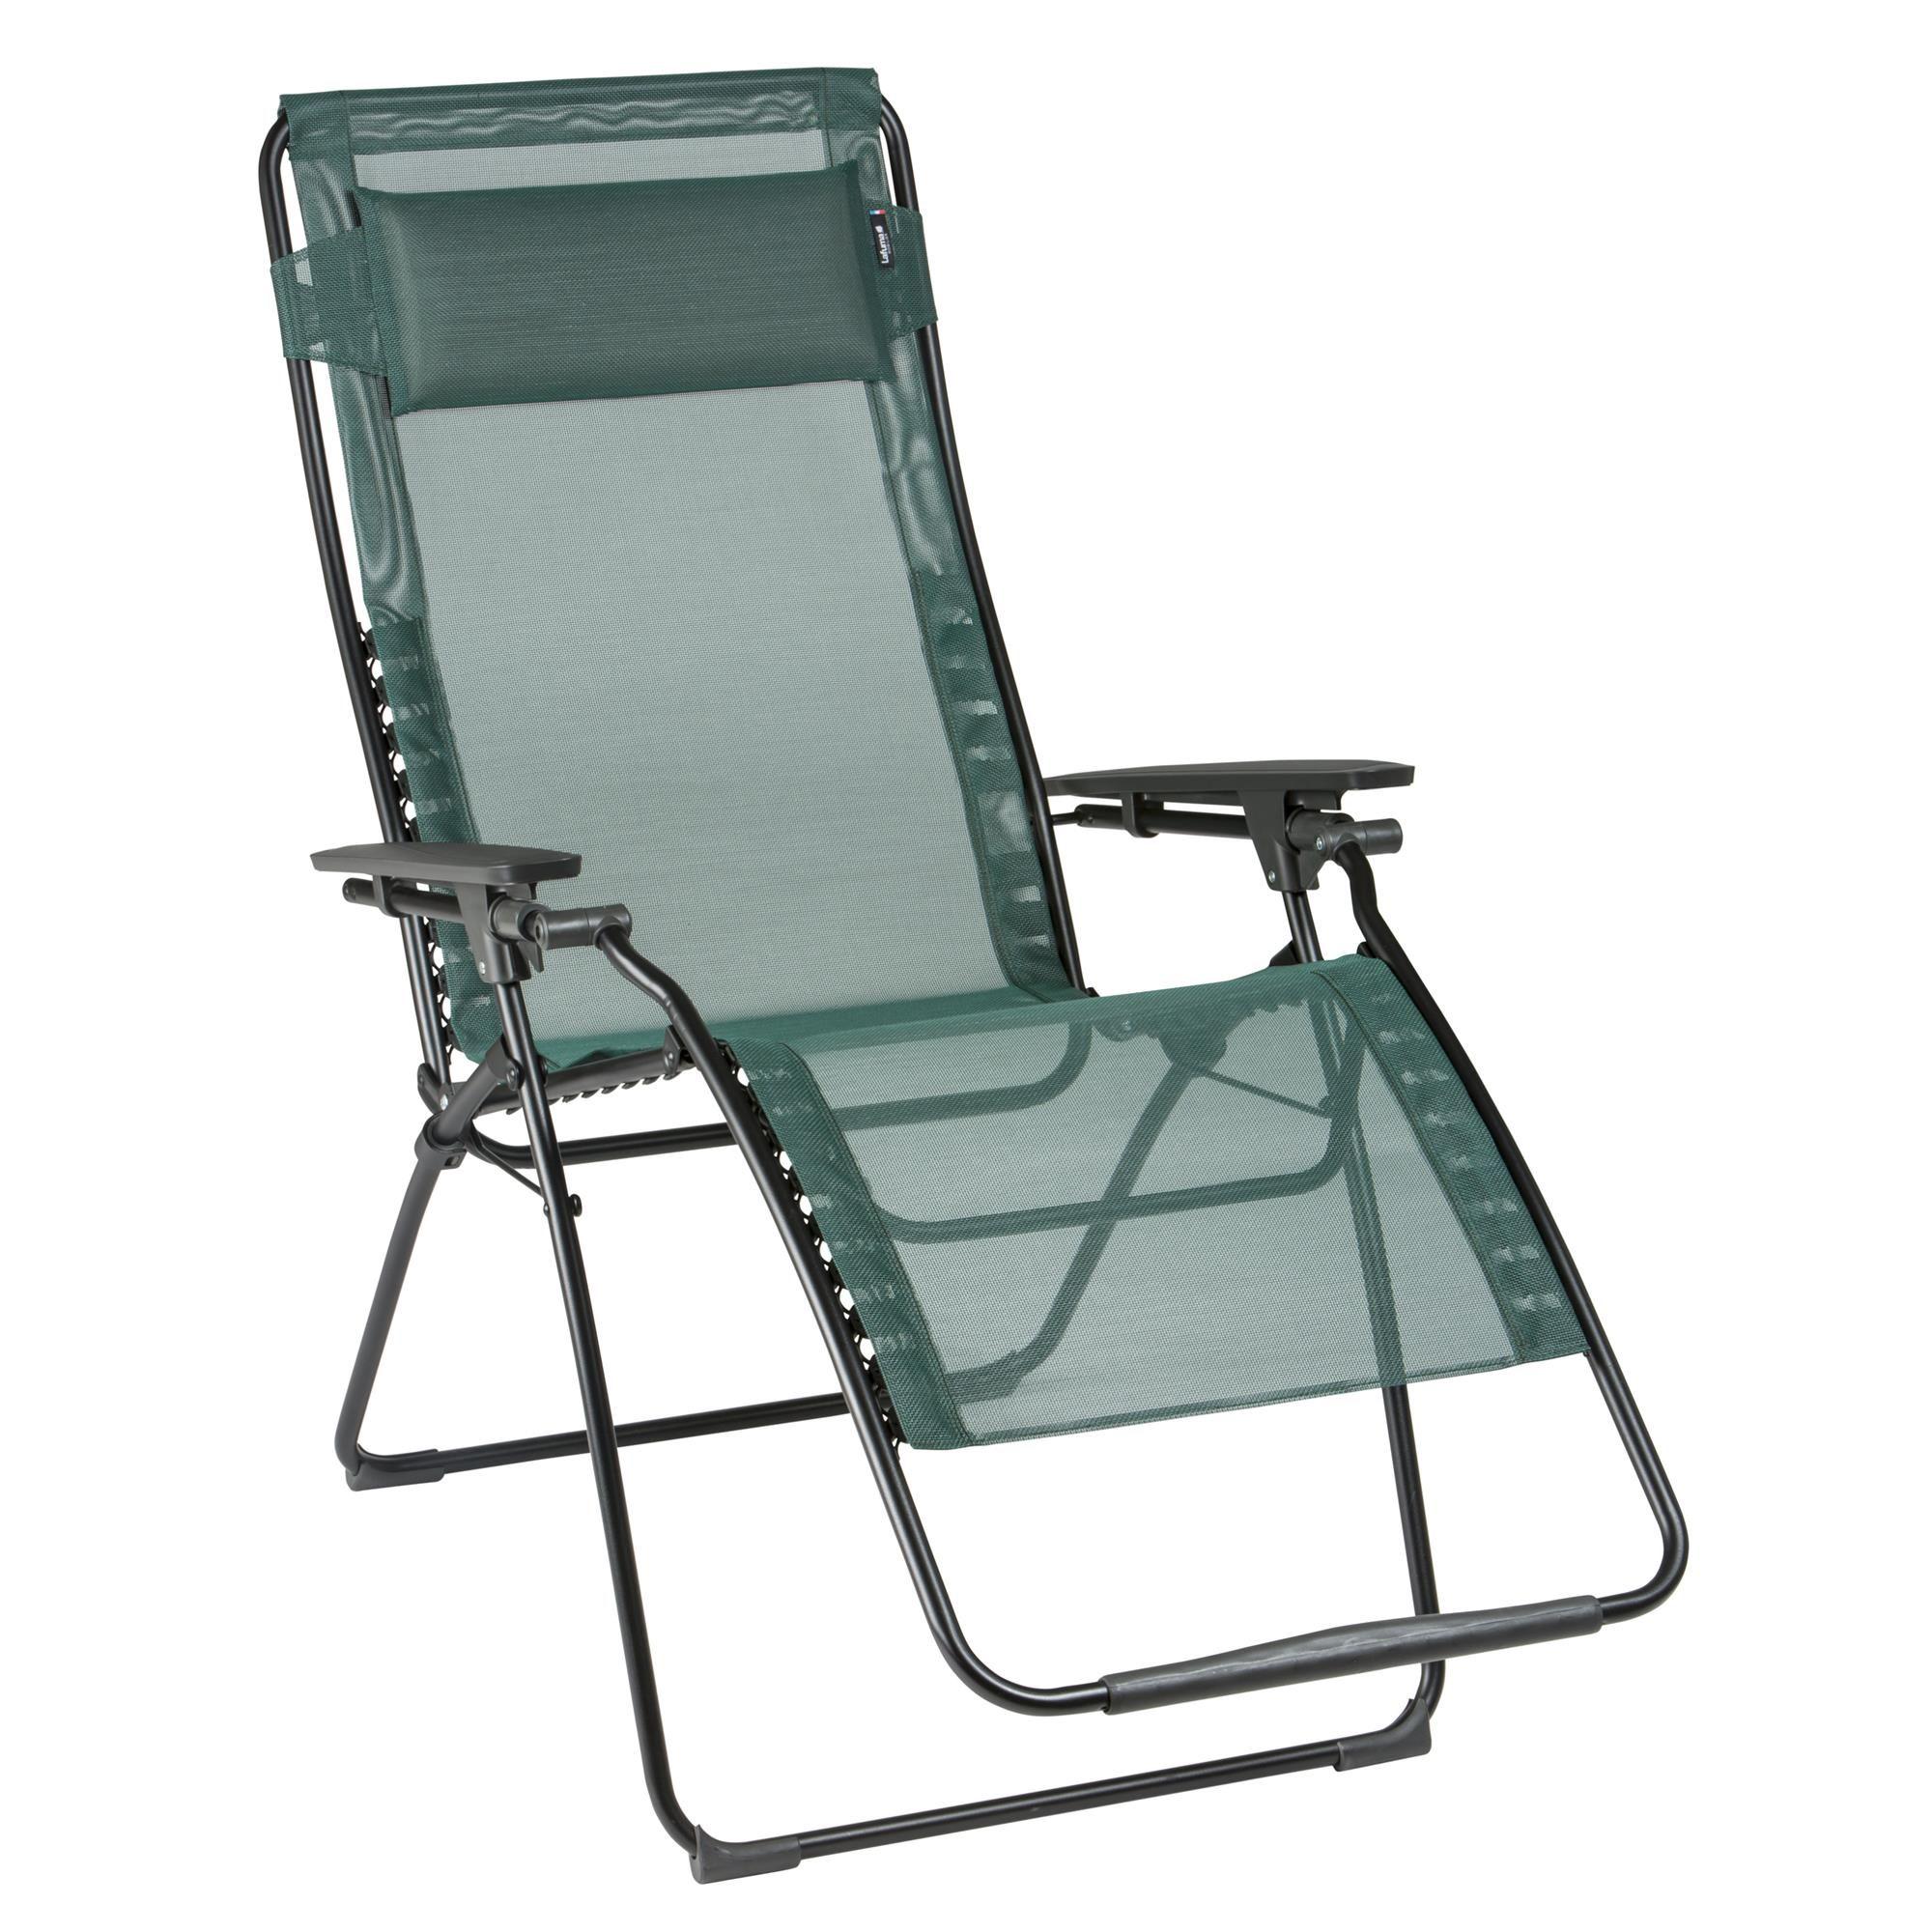 Xtend Angebote Lafuma Futura XL Batyline® Relaxliege: Category:  Campingmöbel U003e Campingliegen Item